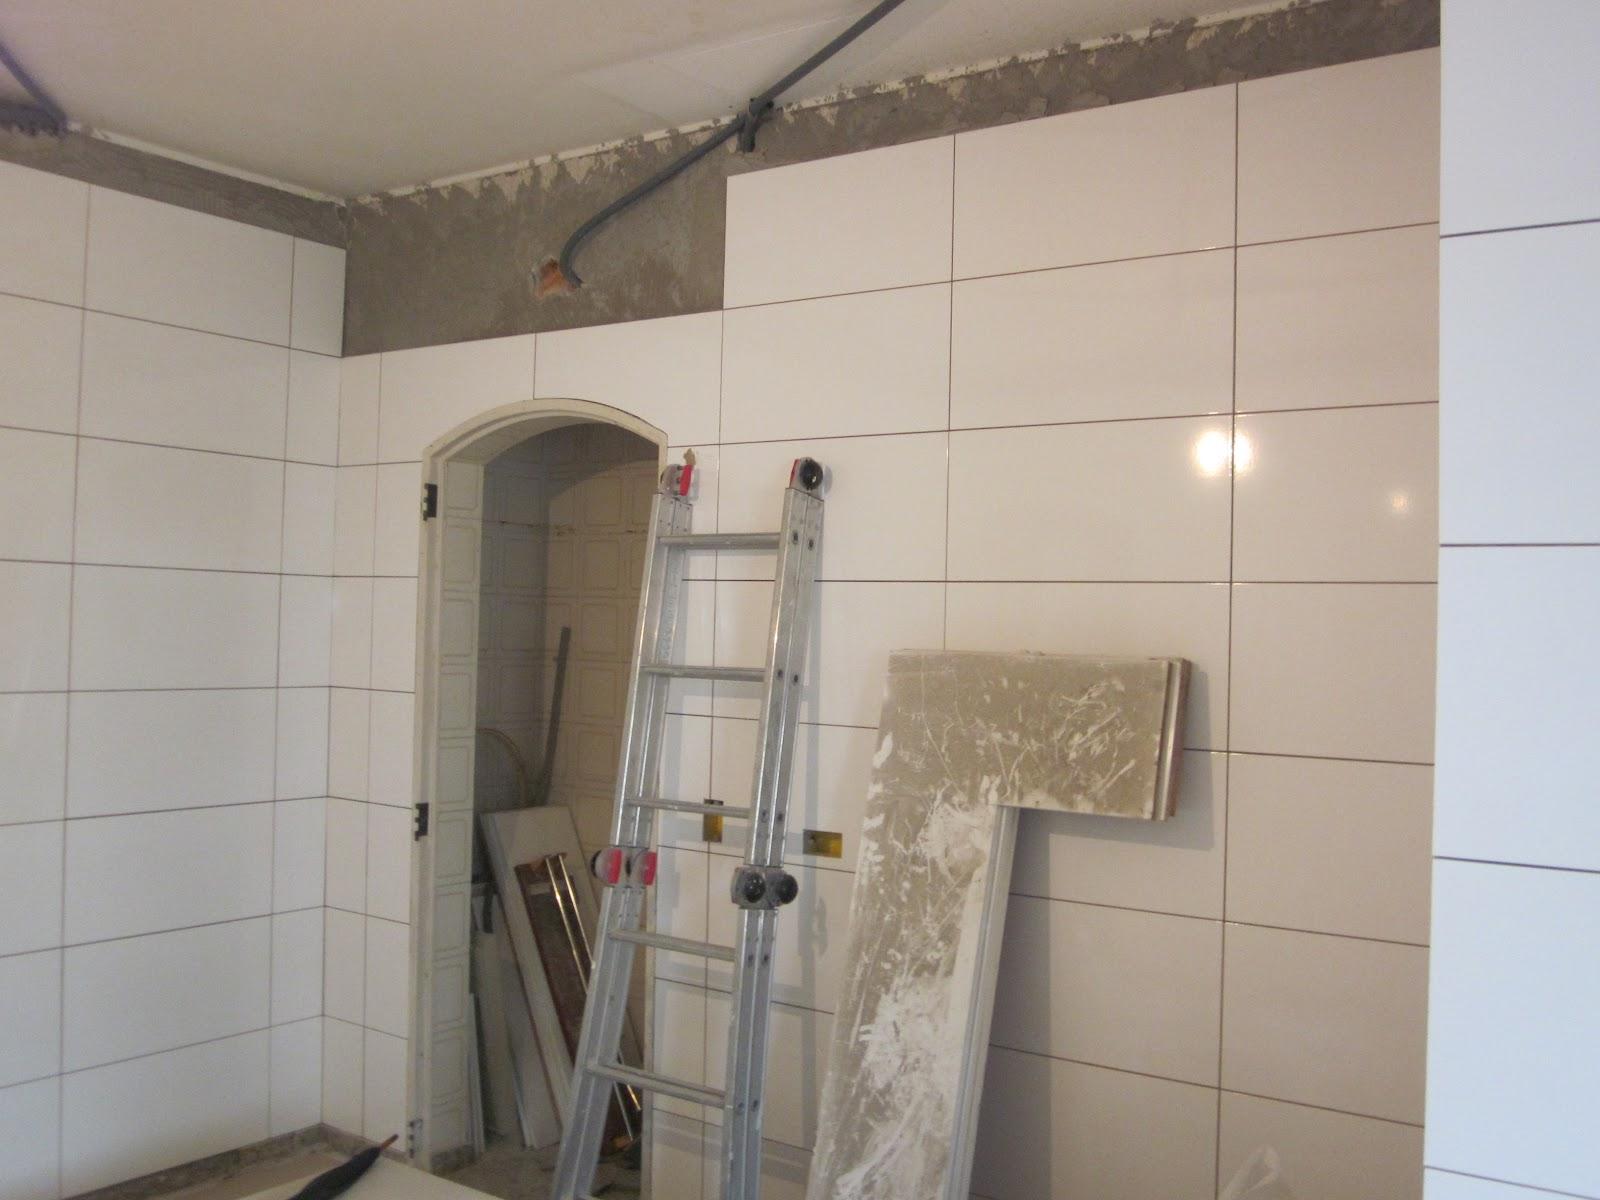 Azulejo Para Banheiro 2 HD Walls Find Wallpapers #776654 1600x1200 Azulejo De Banheiro Como Limpar